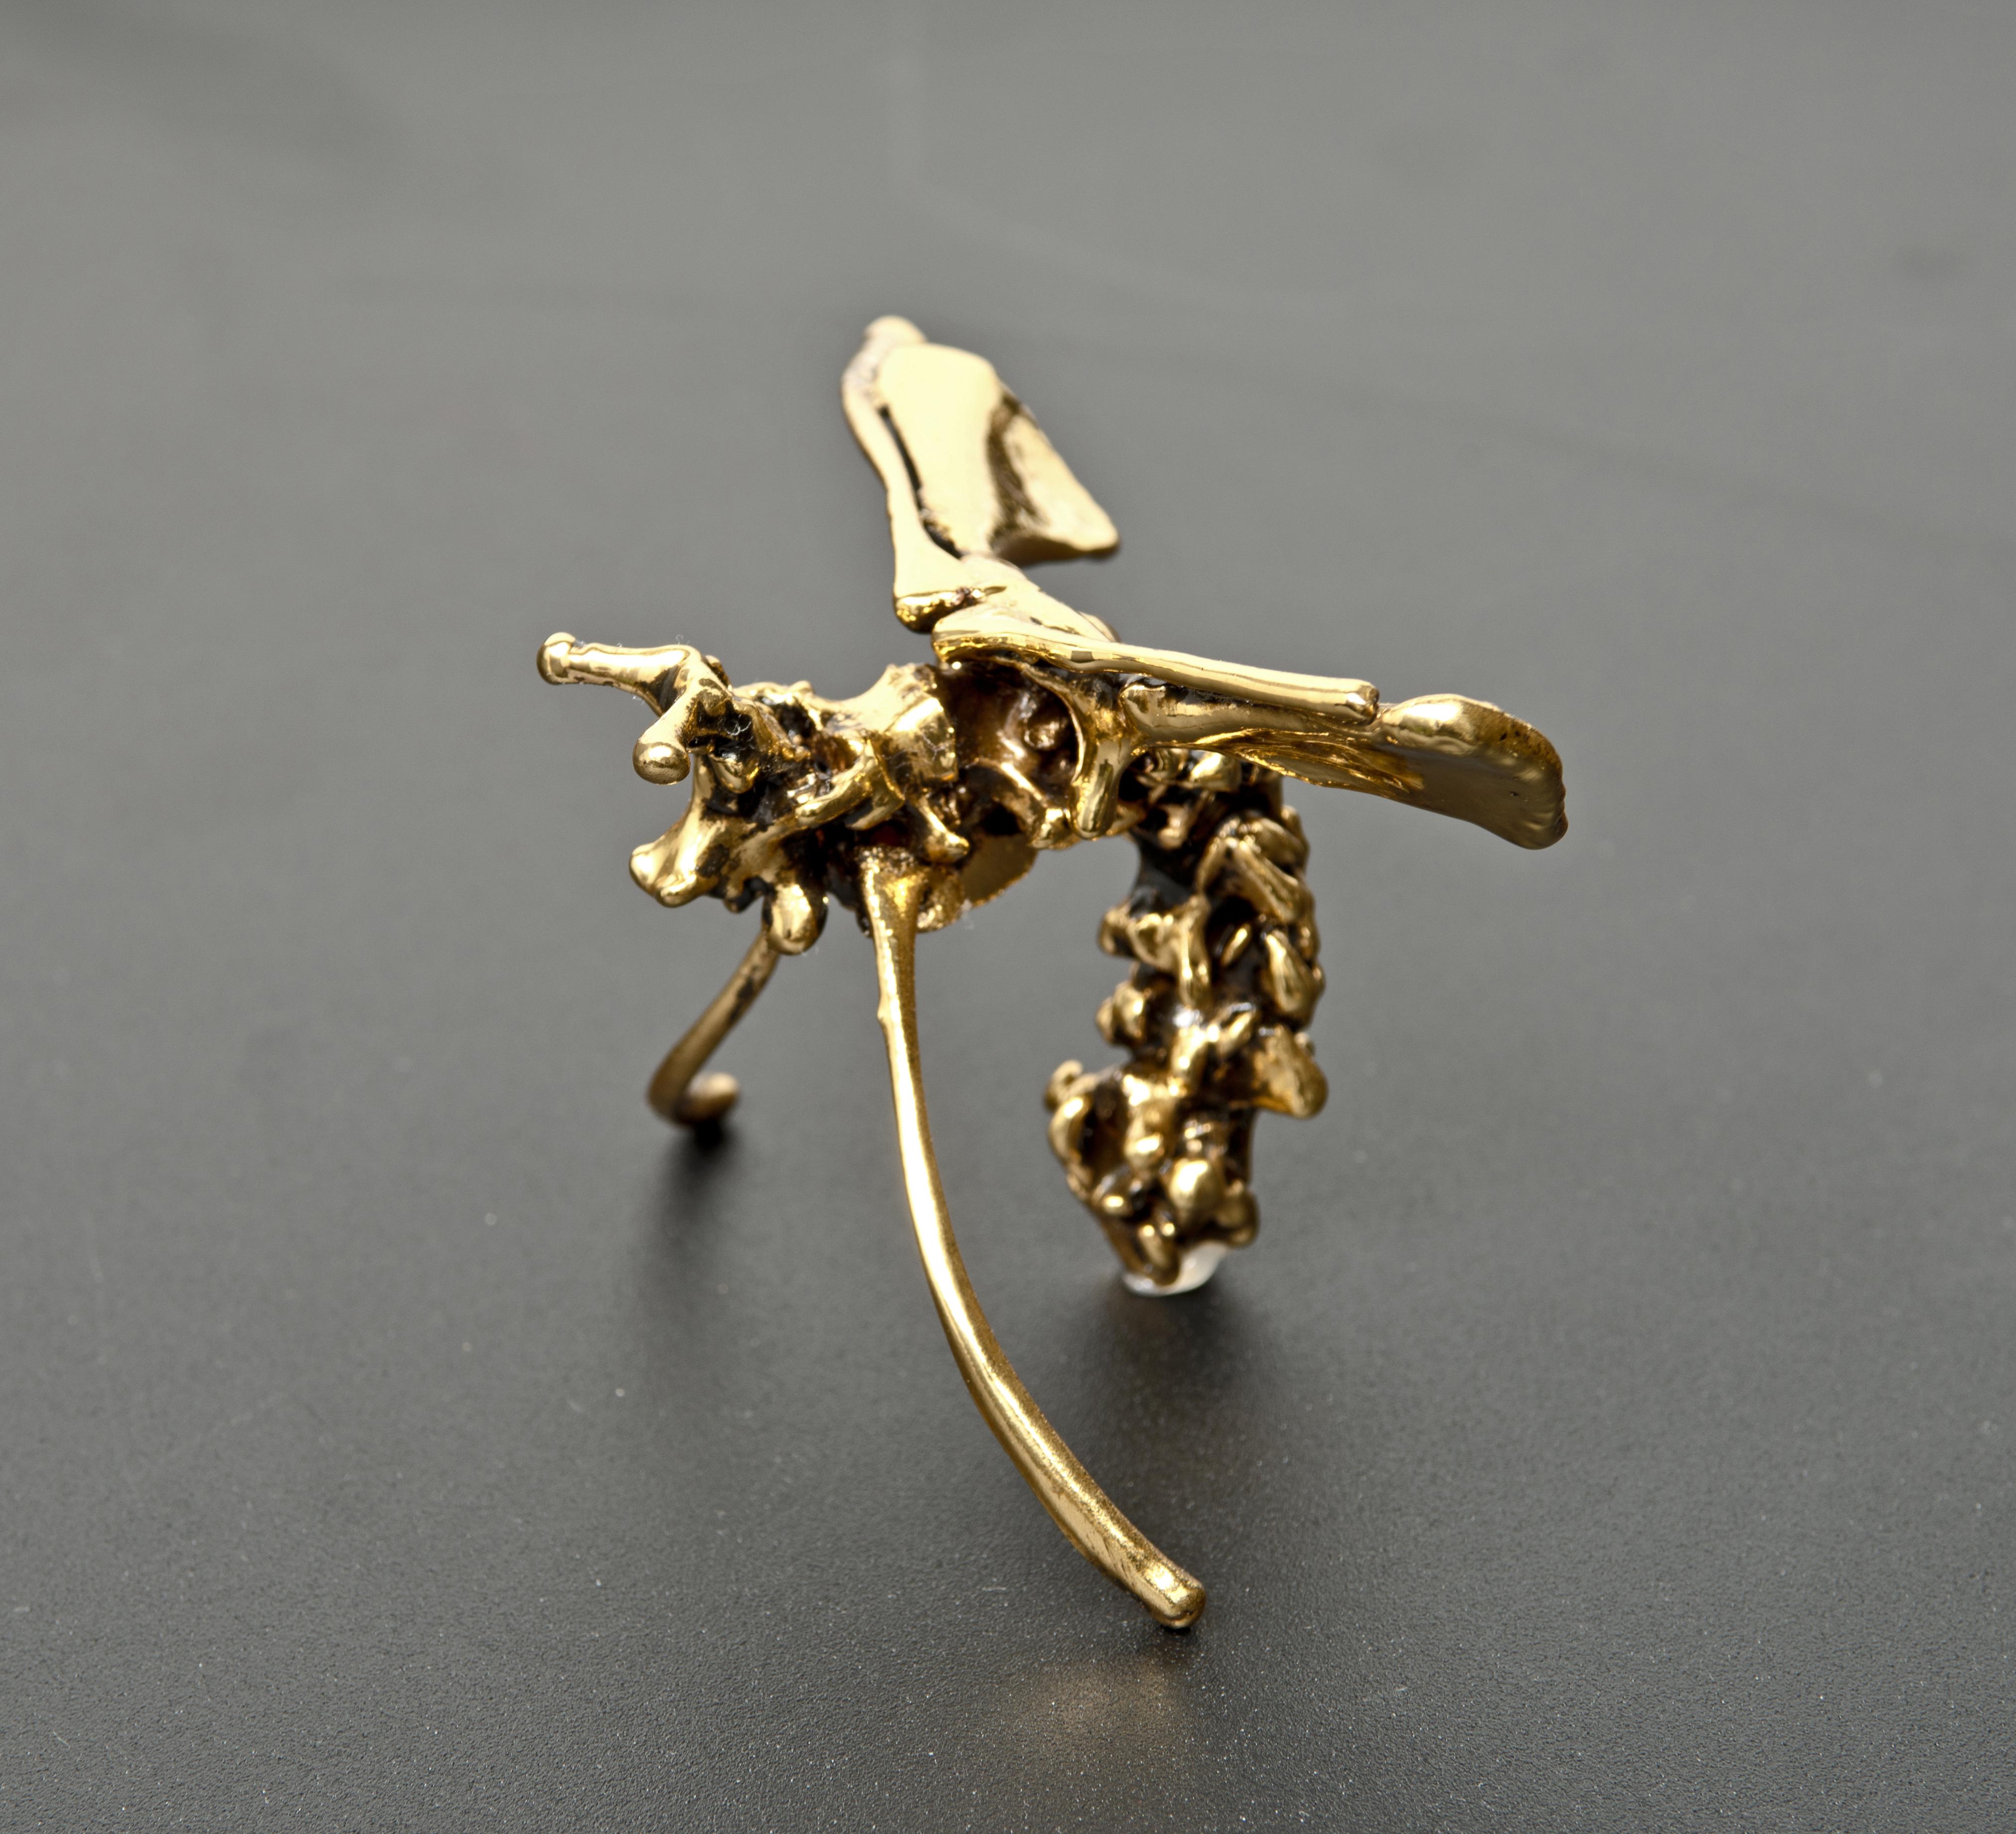 Ekin Saclioglu, Gold plating on various animal bones, 10x6x6cm_2014